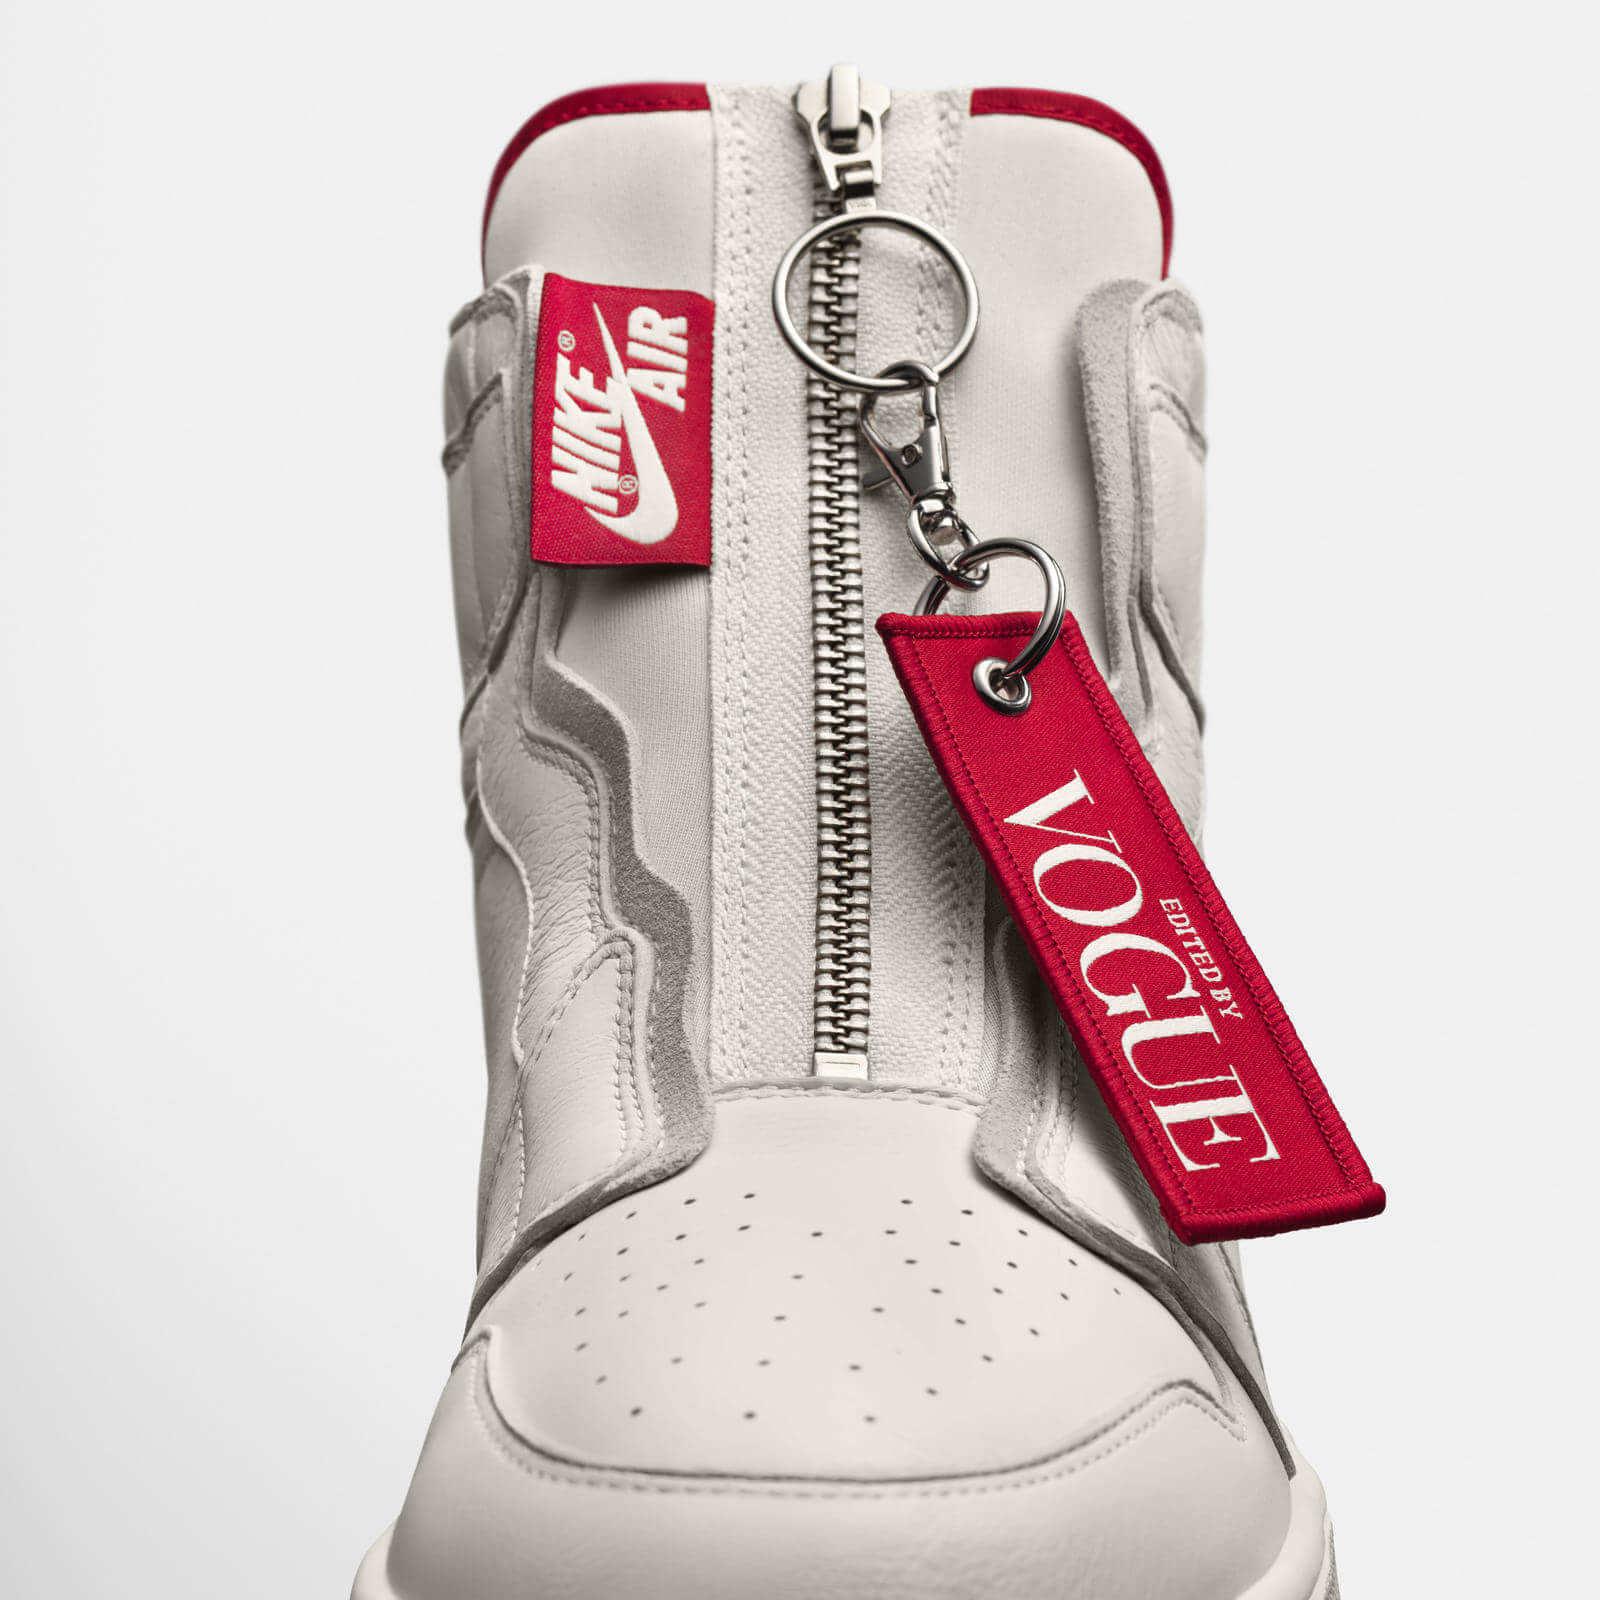 Vogue x Nike by Anna Wintour. Fotografía: Vogue/Nike